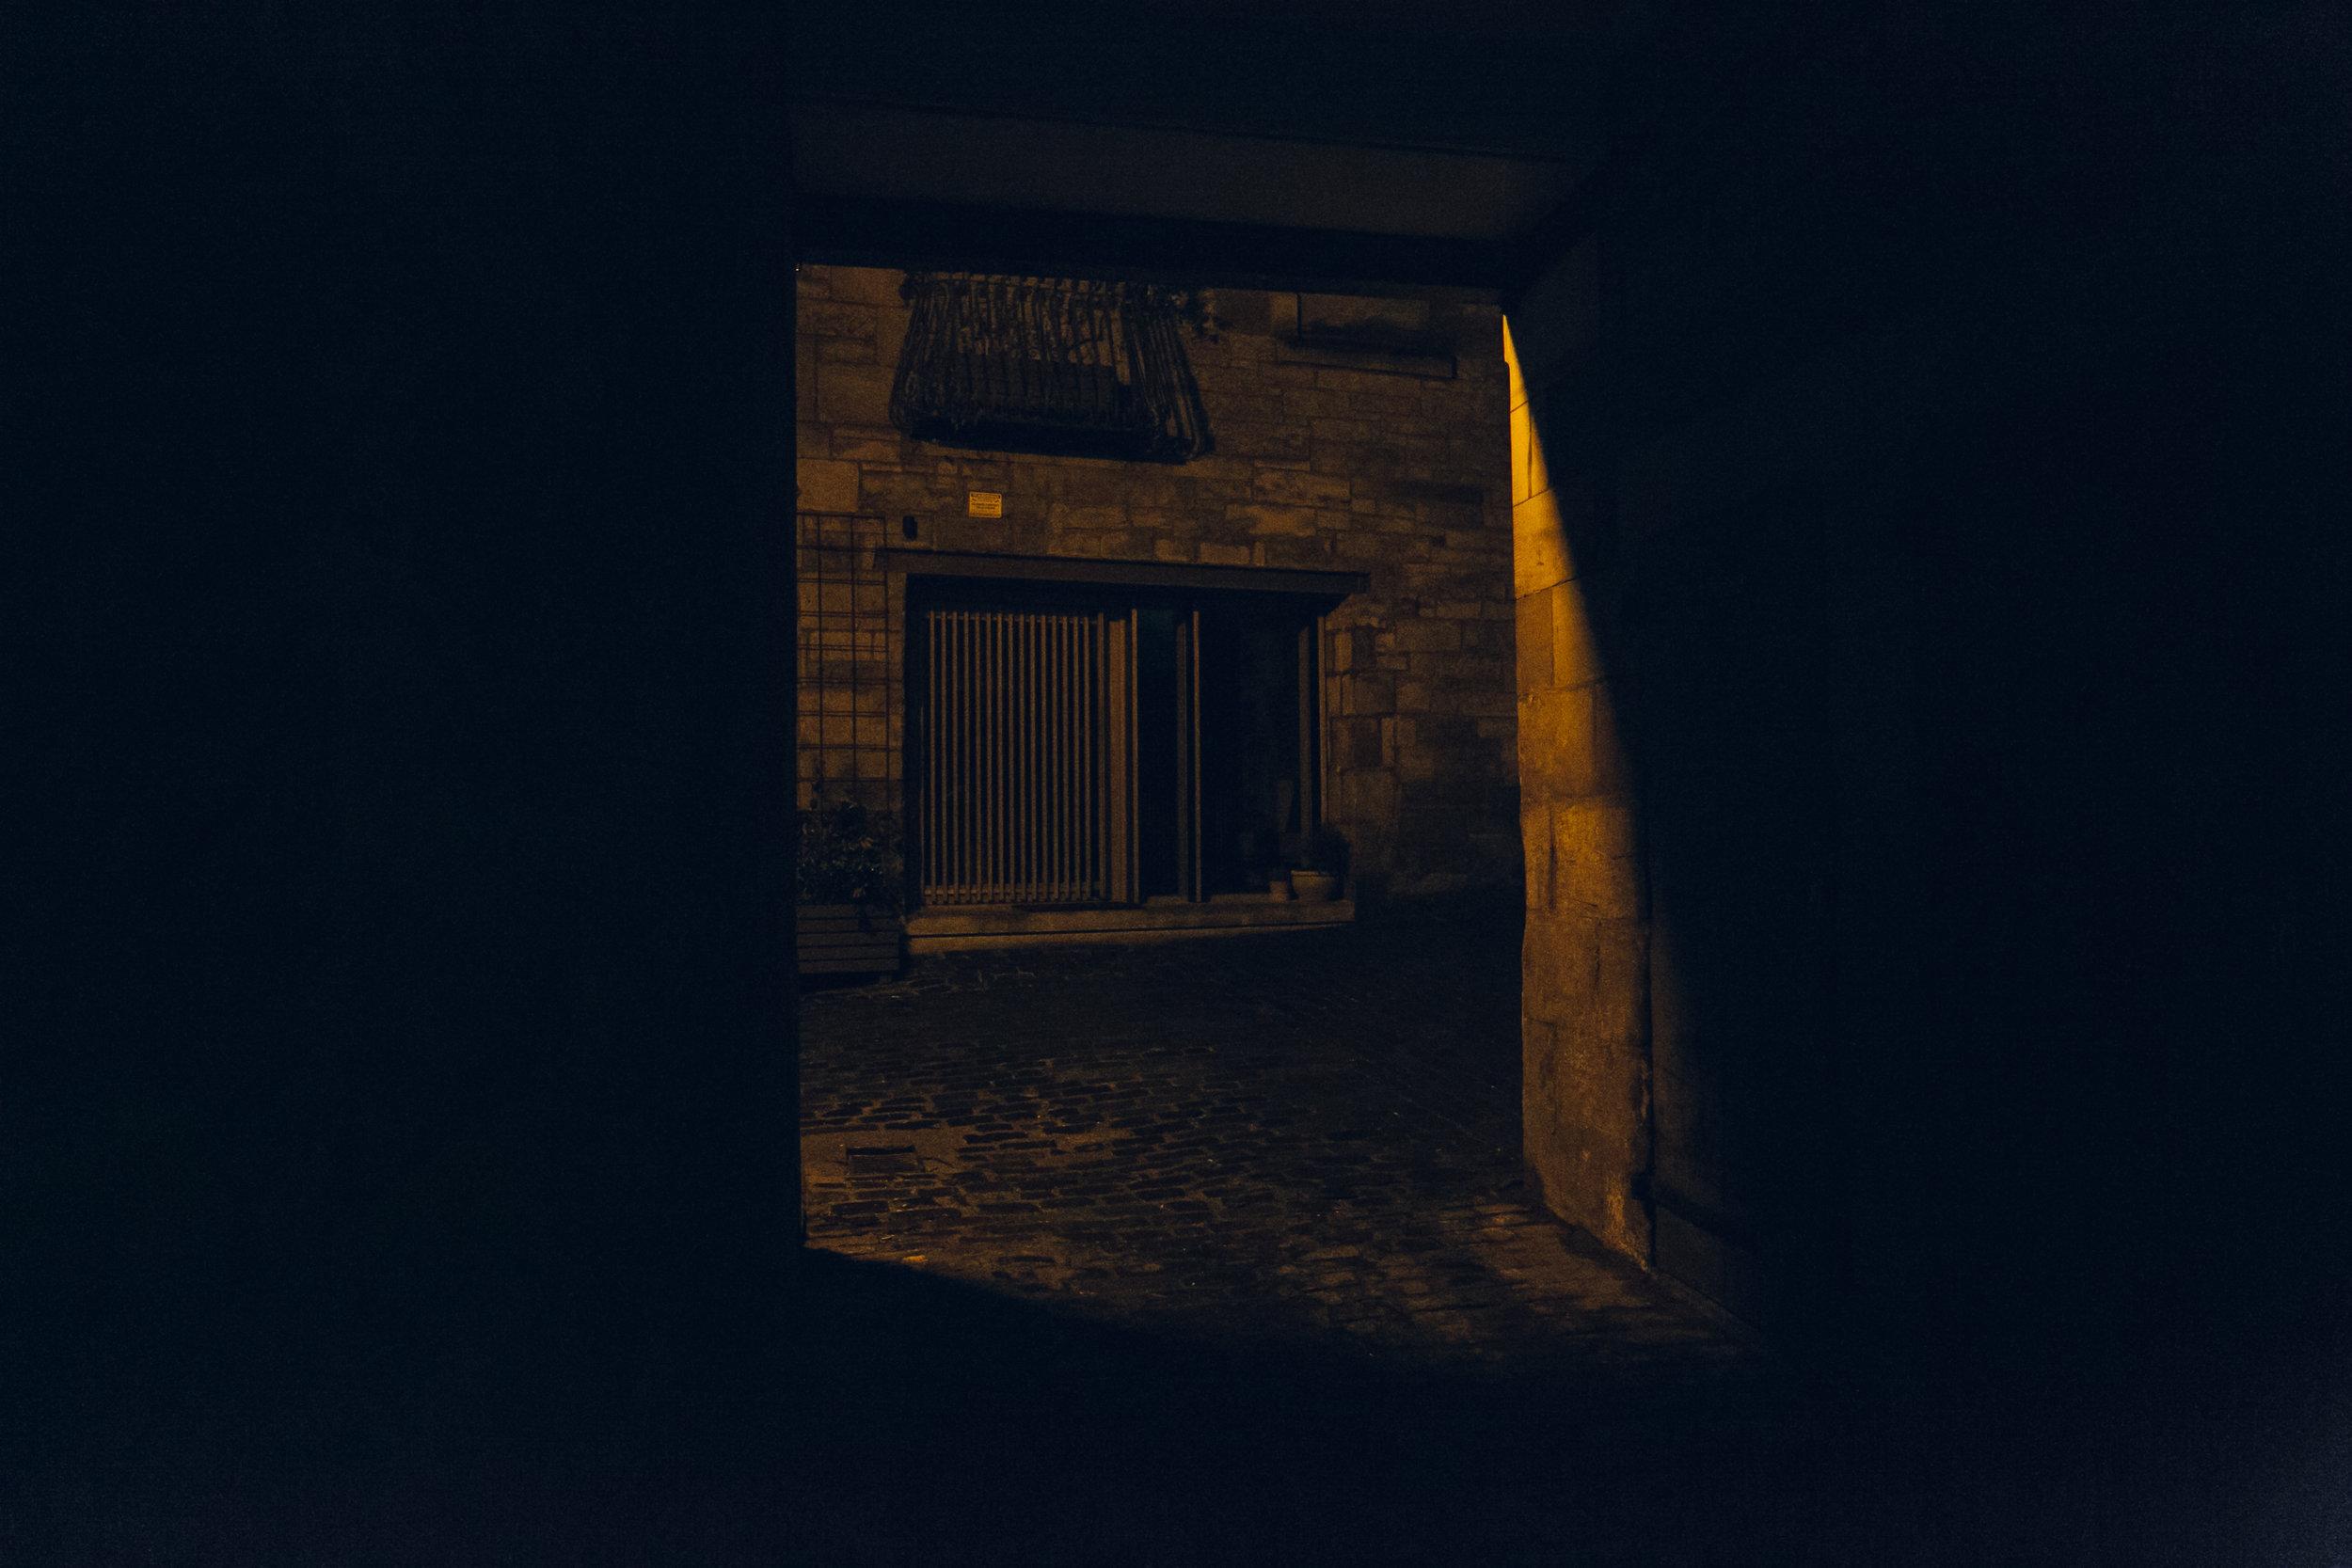 Porteous' Studio in Edinburgh, photographed by Haarkon